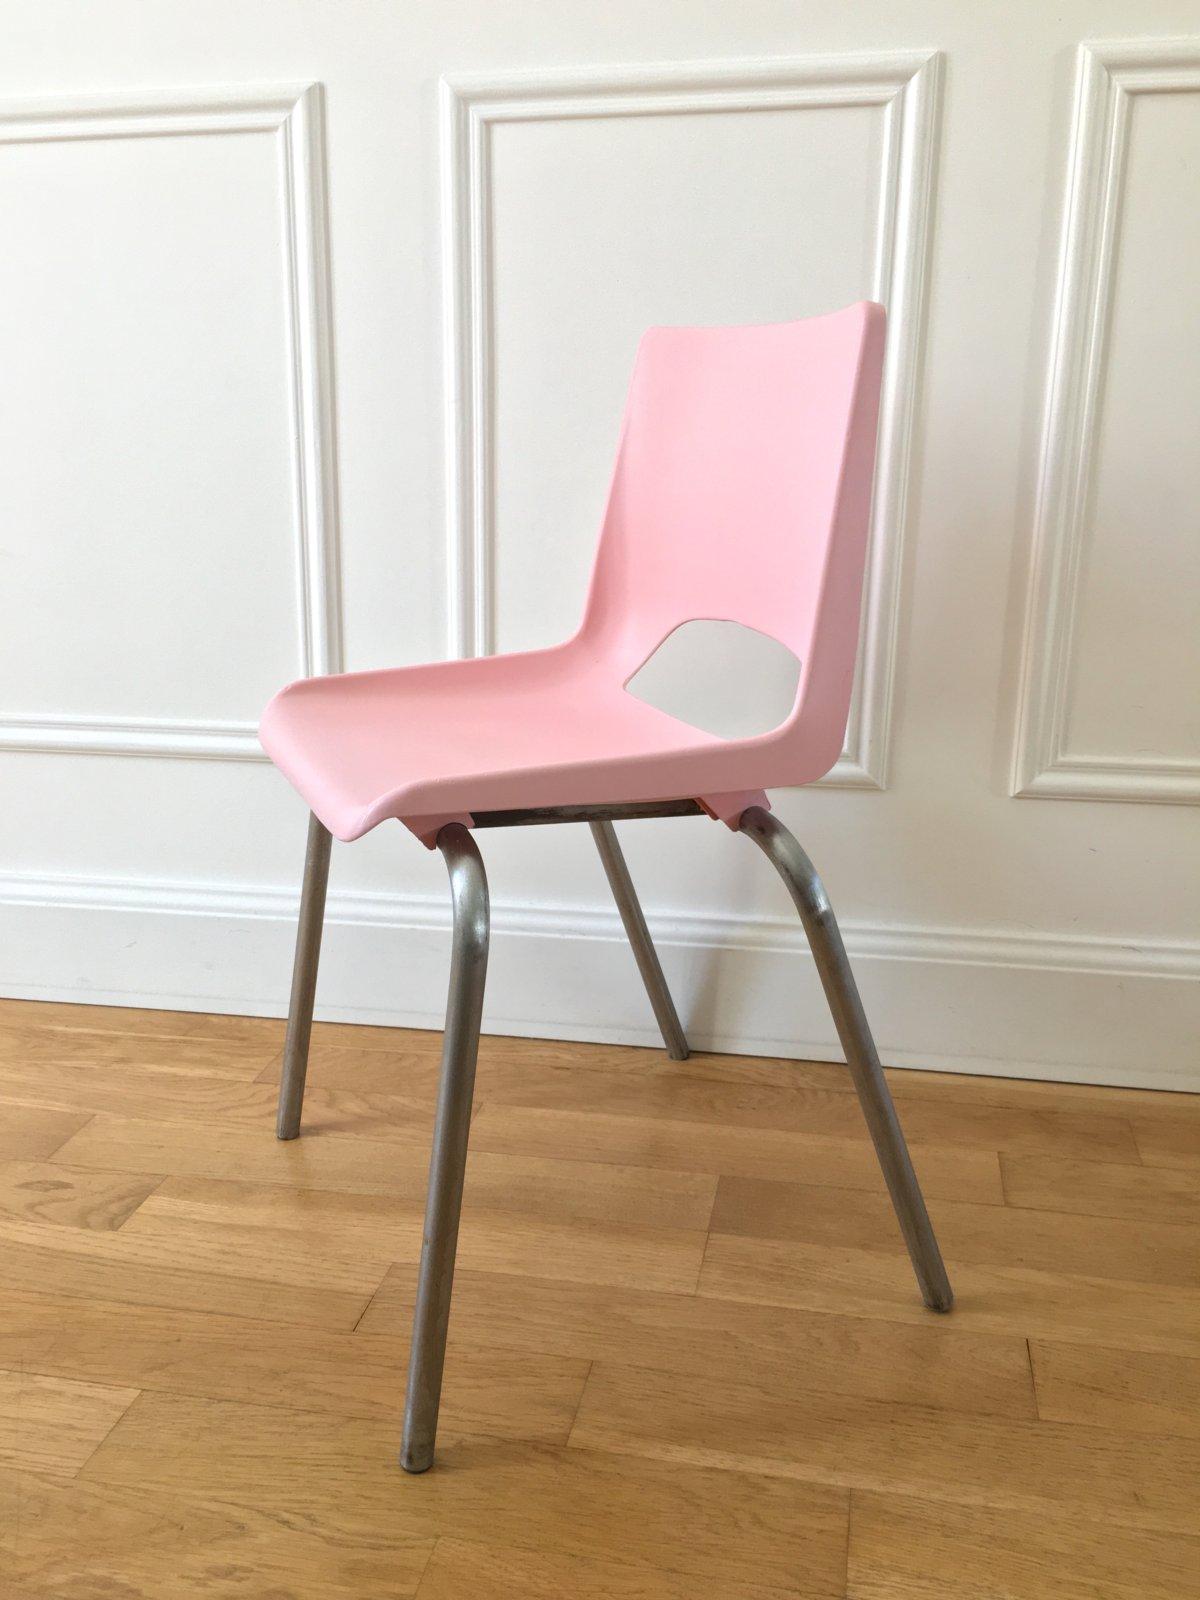 Chaise écolier rose